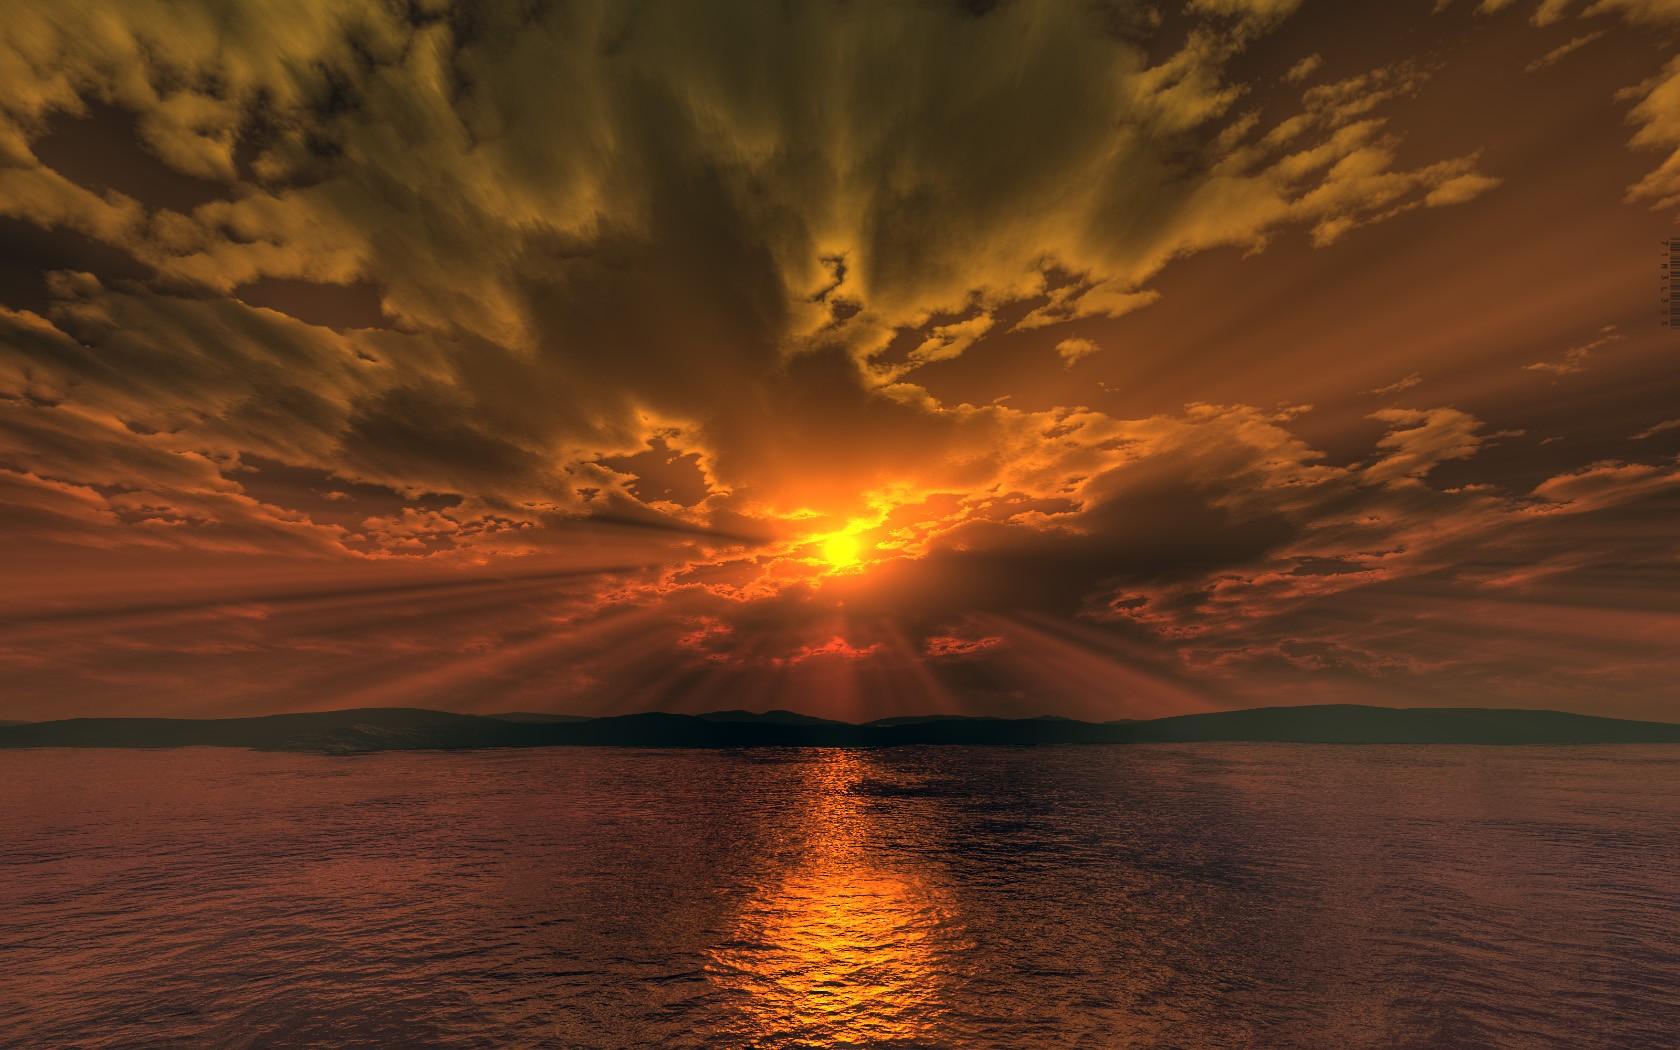 Atardecer naranja en el mar - 1680x1050